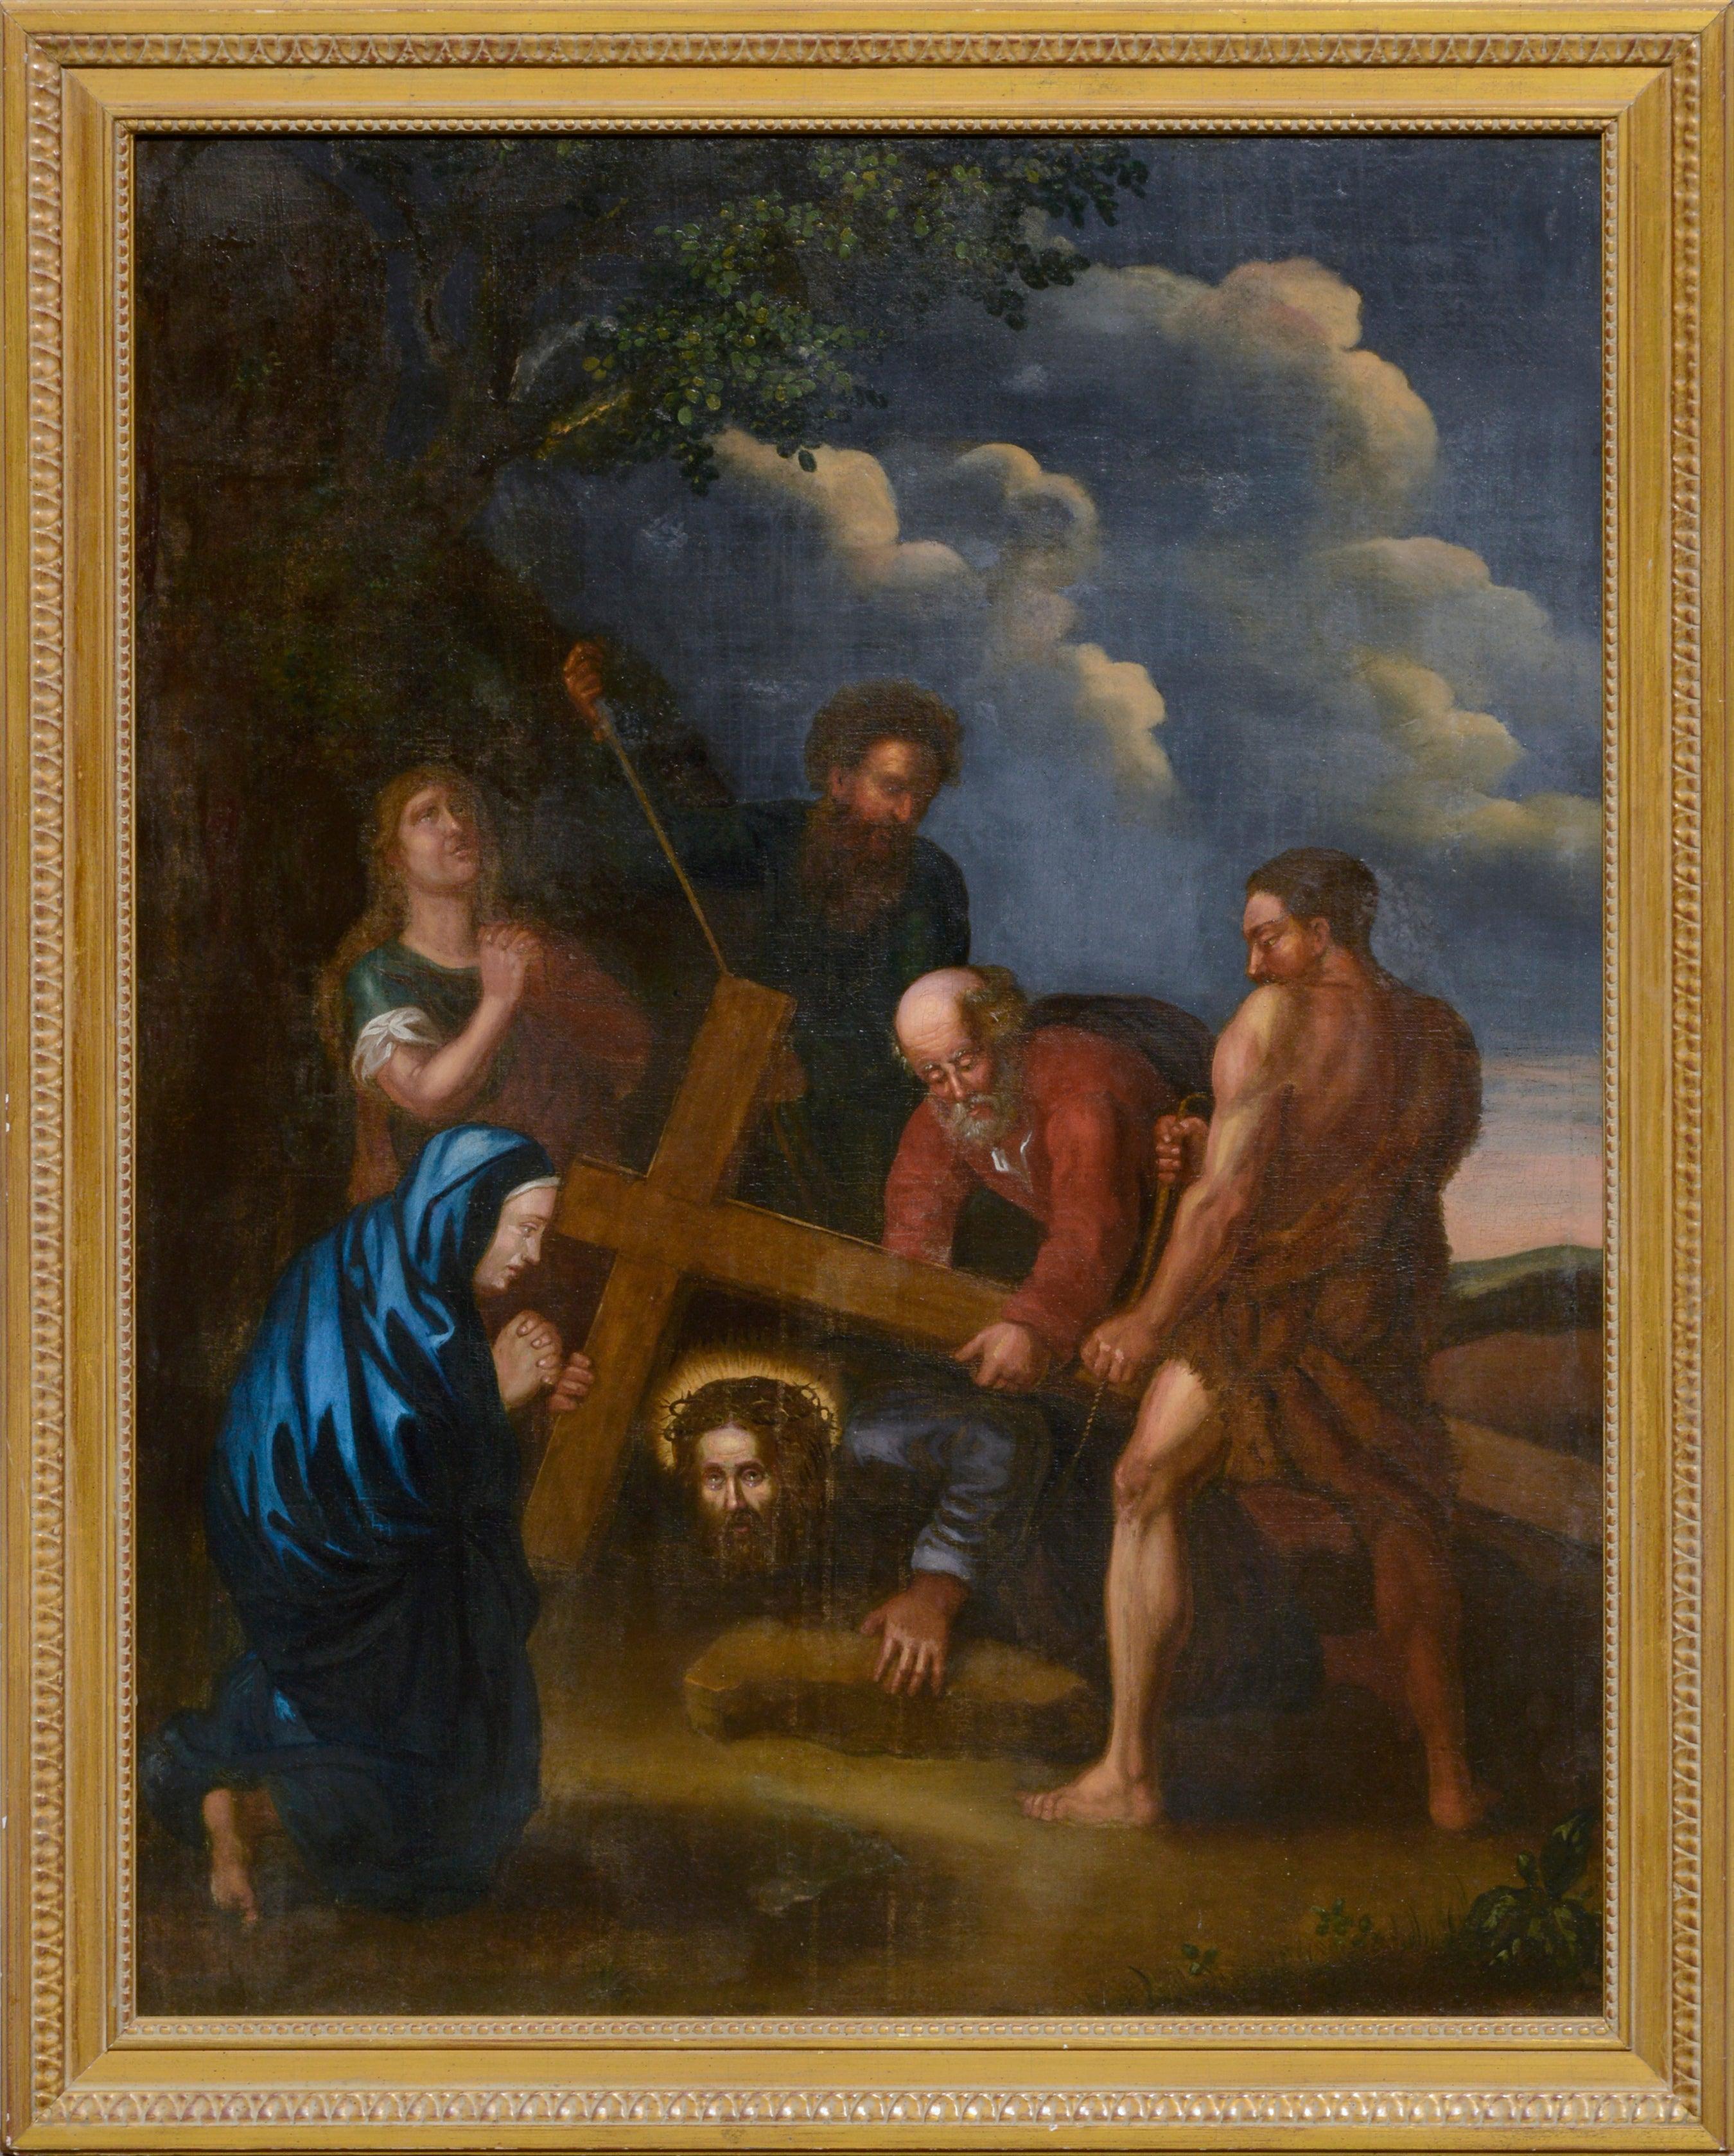 Christ Falls on the Way to Calvary Circa 17th-18th C. Dutch-Italianate School